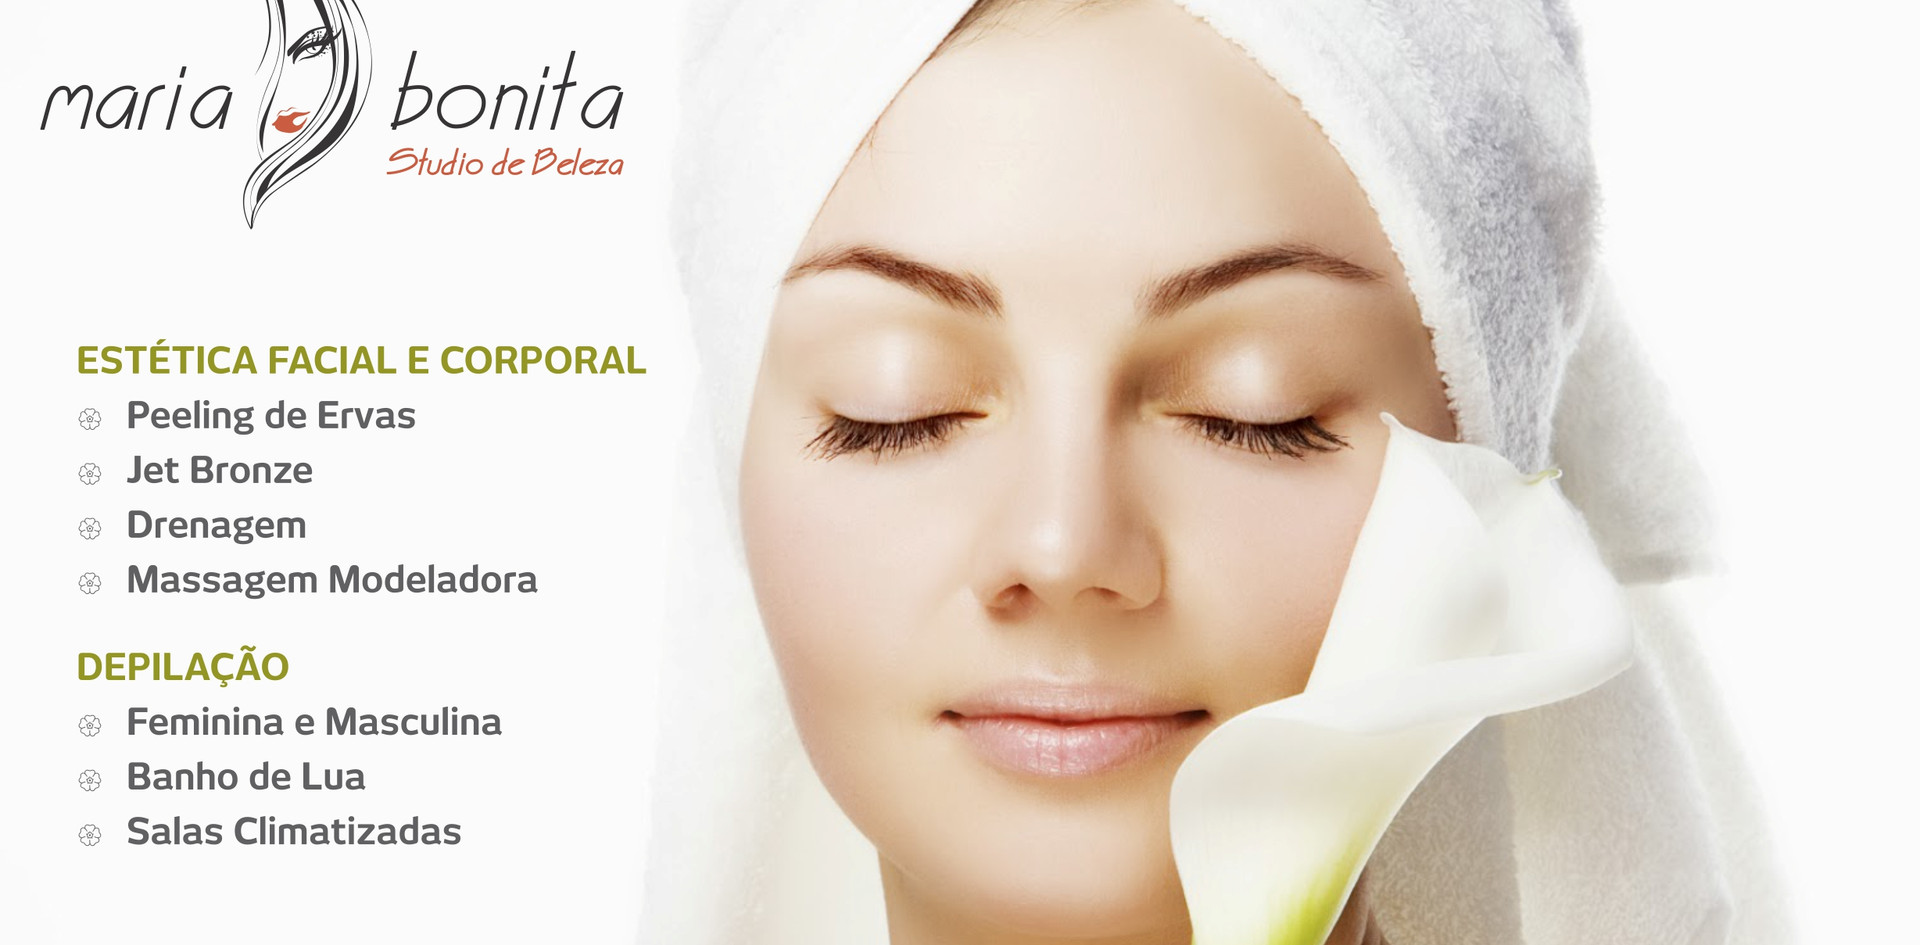 Flyer Maria Bonita 4.jpg